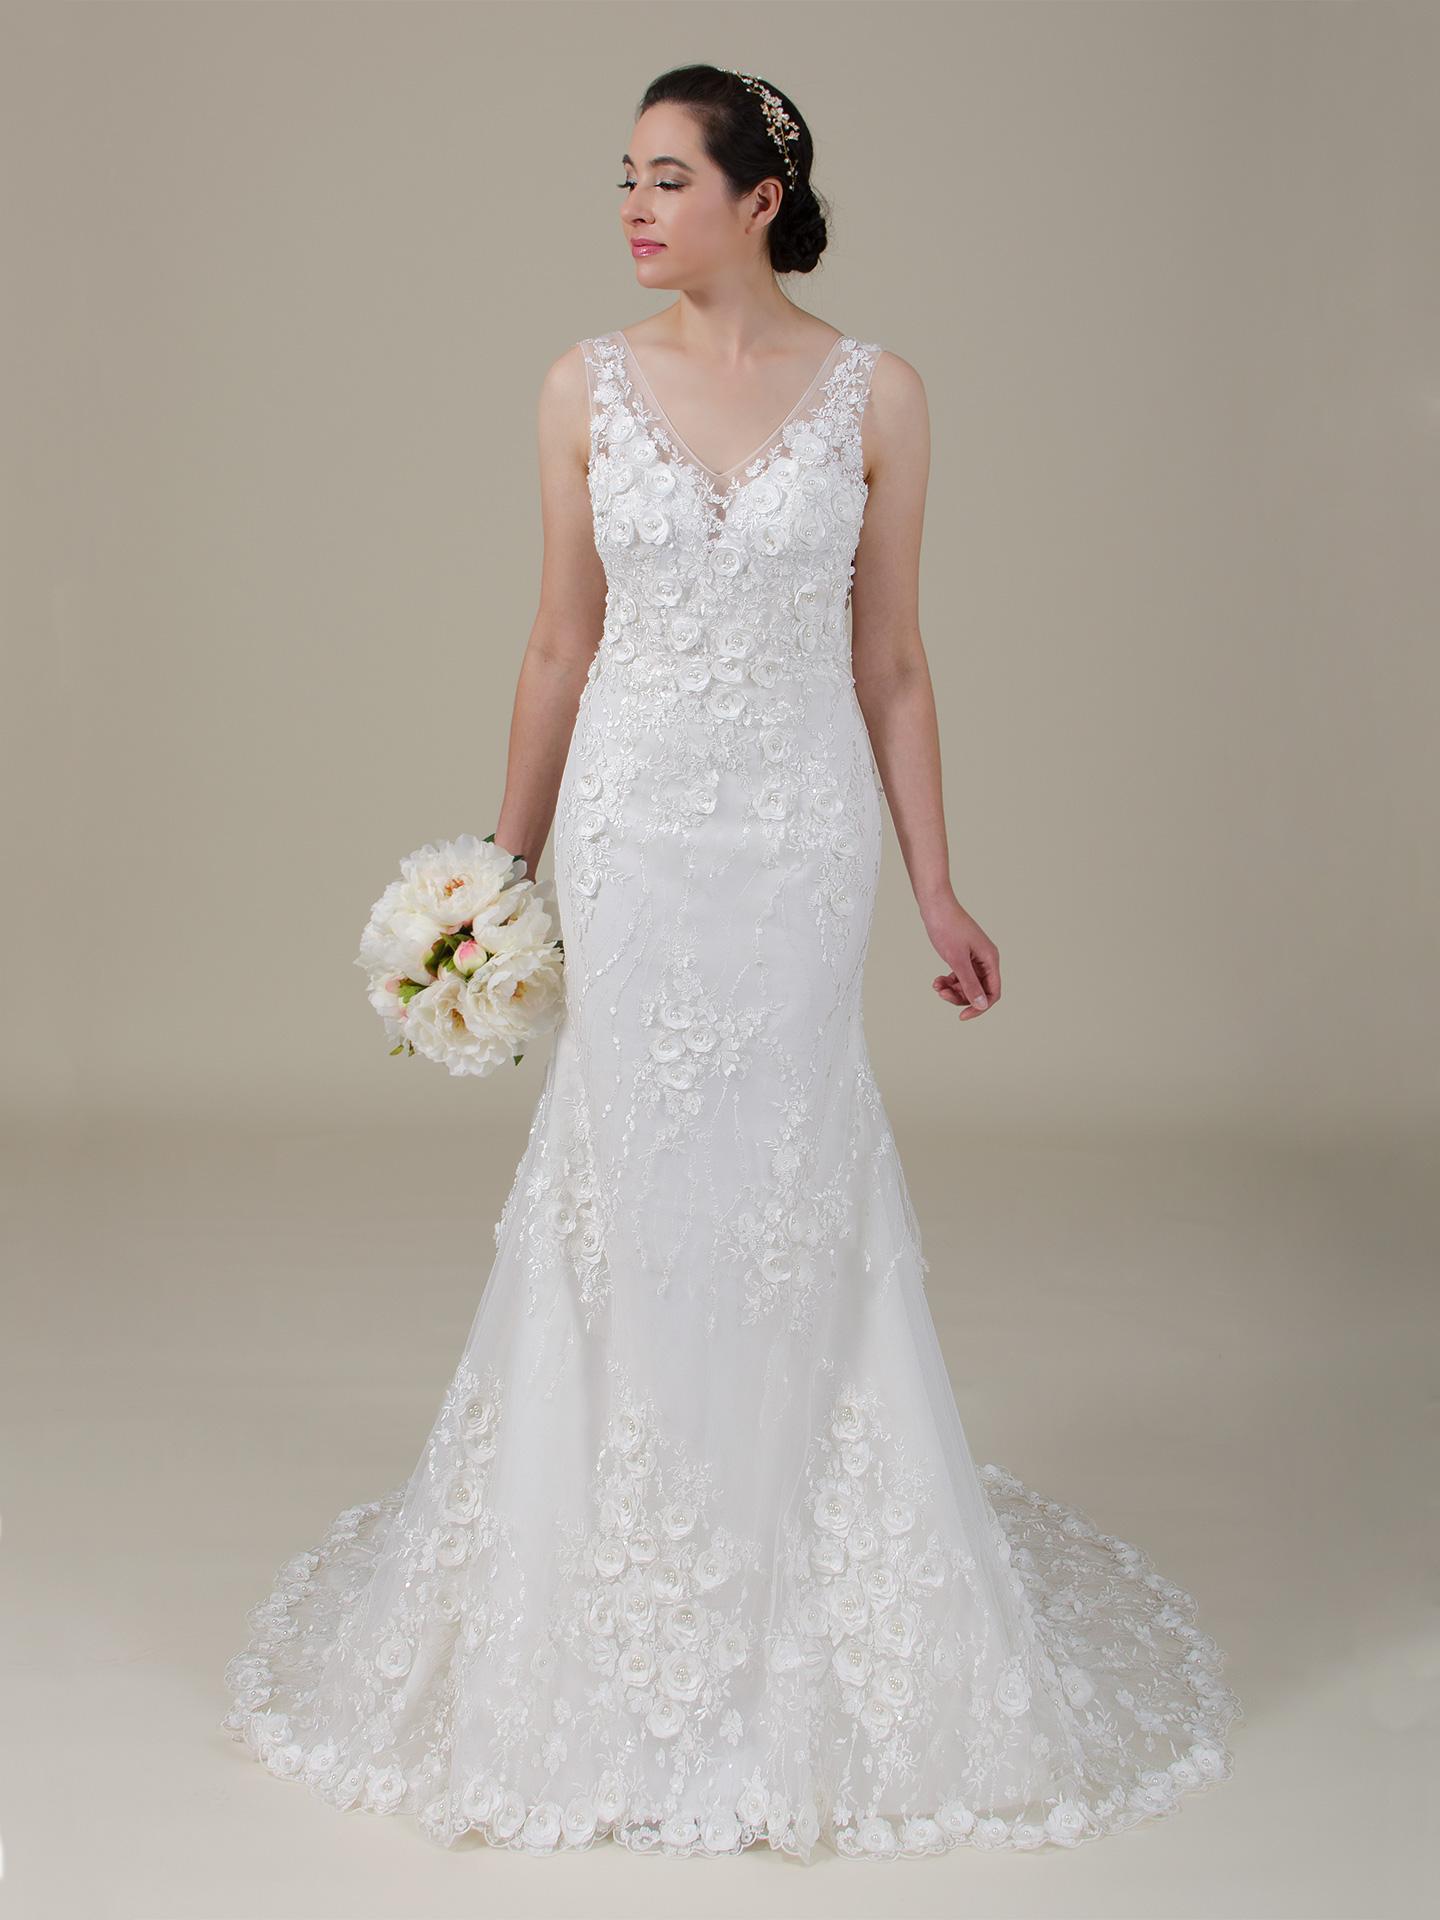 3d Flowers Lace Wedding Dress 4062